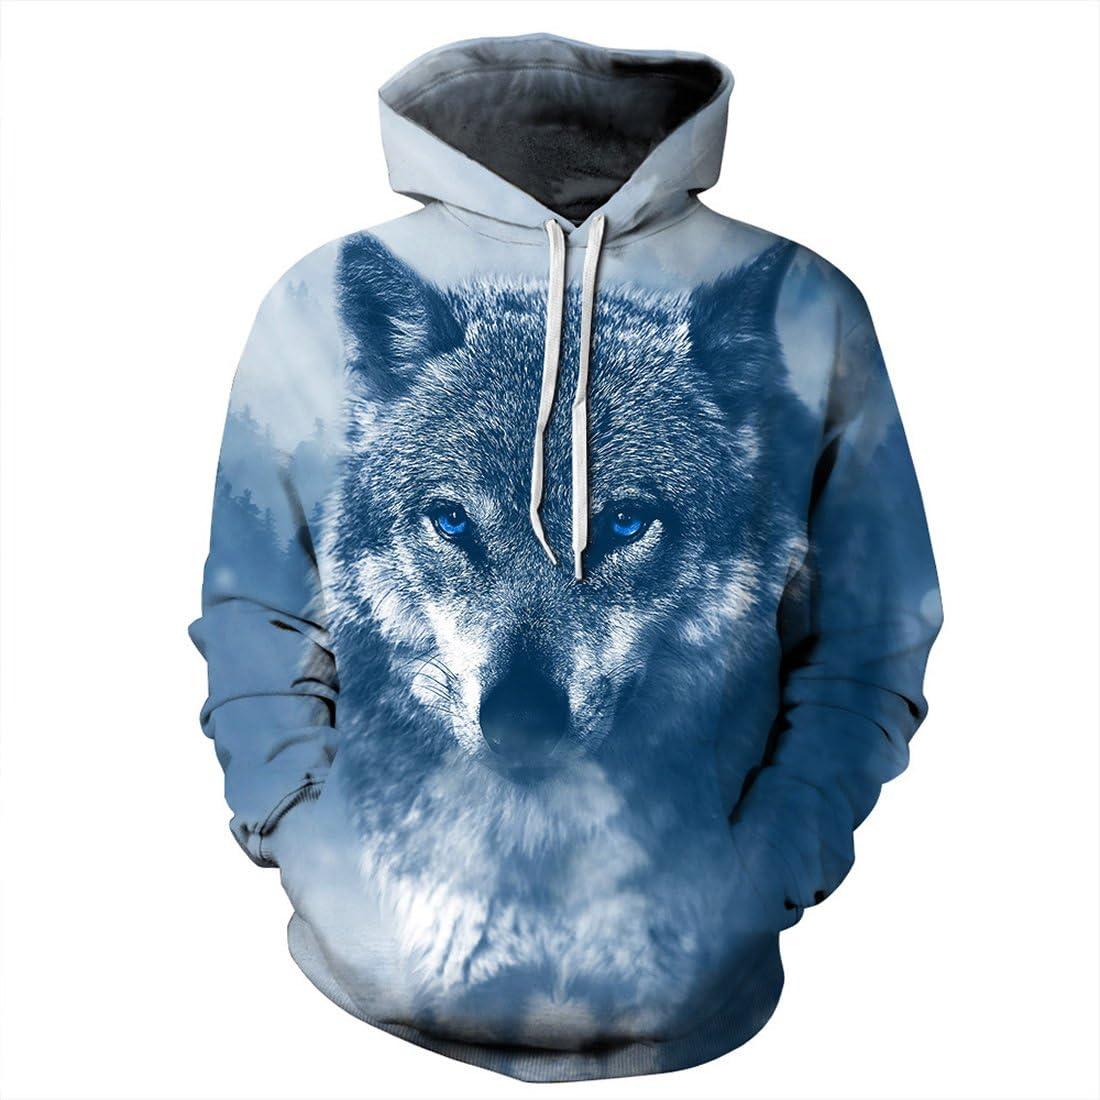 Comeon Wolf Hoodie,Couple 3D Cool Oversized Lightweight Pullover Hoodie Hooded Sweatshirt for Men Women